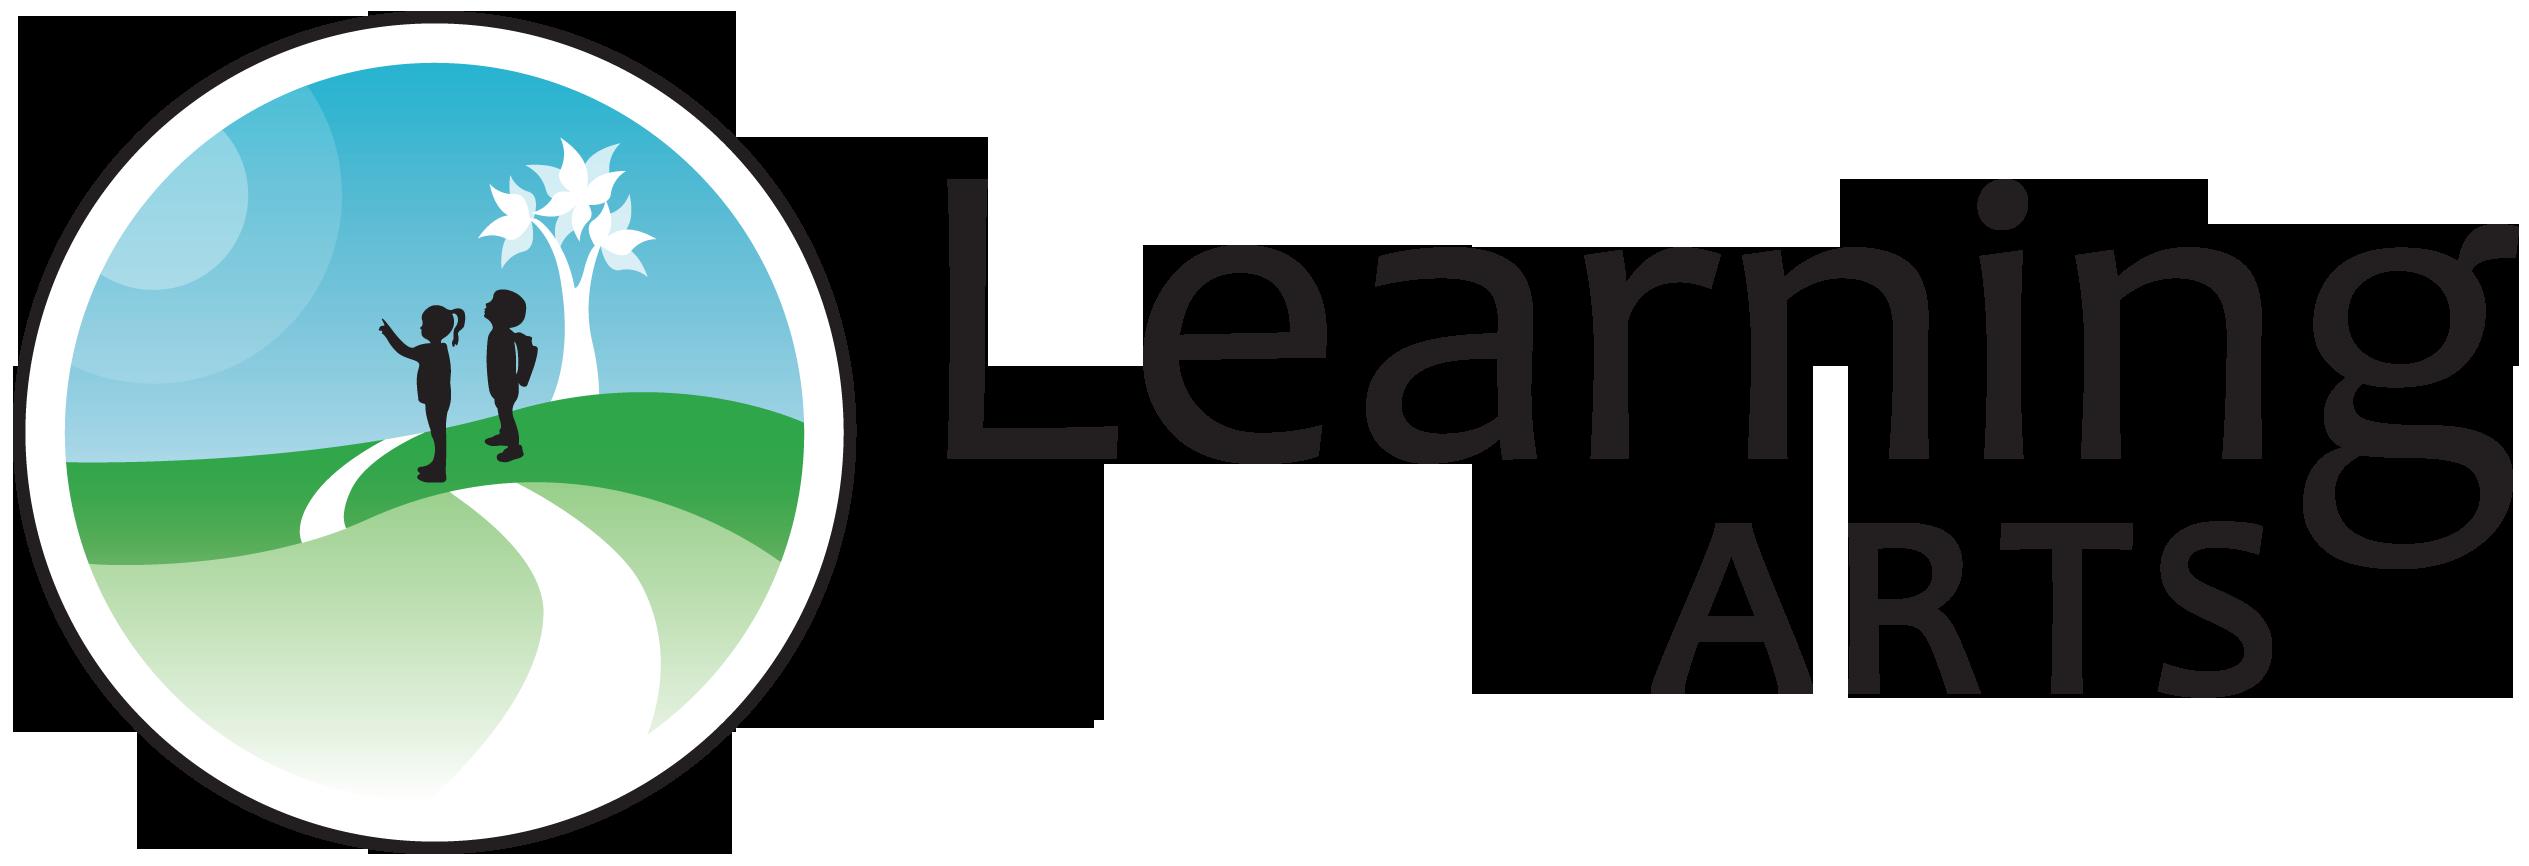 PLATINUM LearningARTS_Logo_FINAL